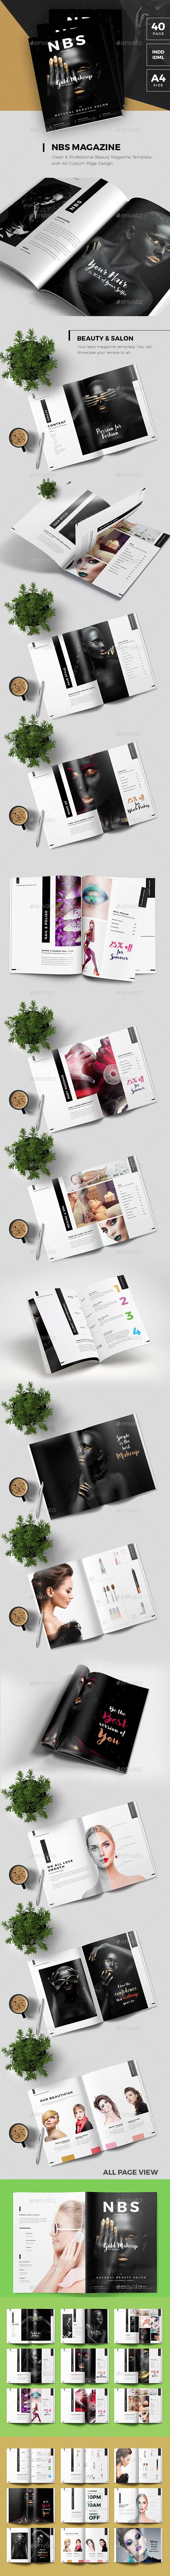 Natural Beauty Salon Magazine - Magazines Print Templates